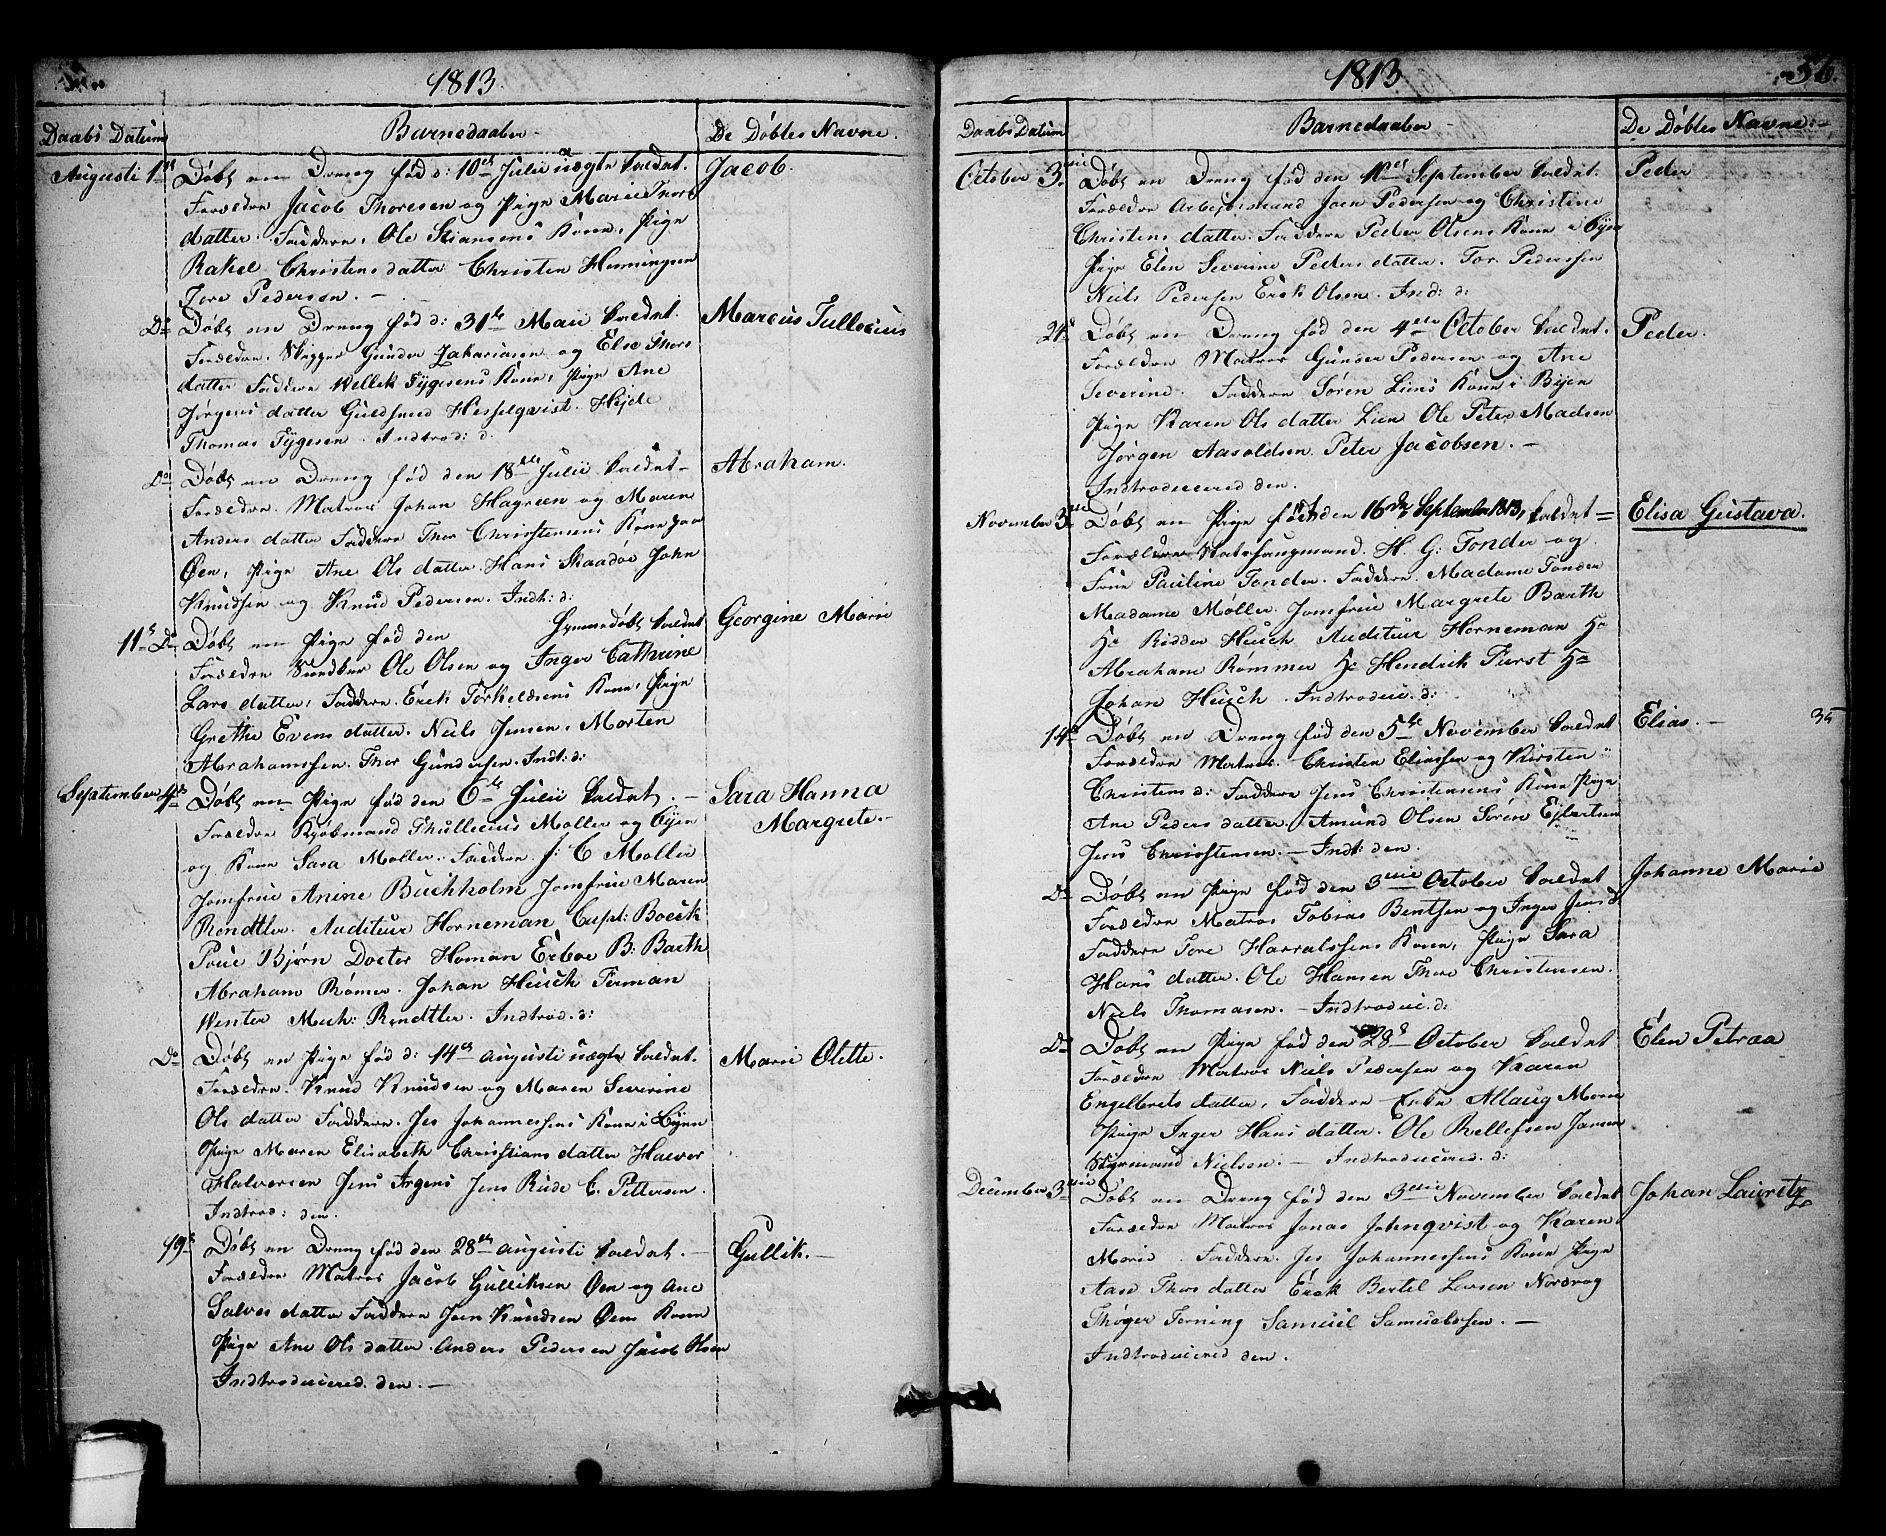 SAKO, Kragerø kirkebøker, F/Fa/L0003: Ministerialbok nr. 3, 1802-1813, s. 56